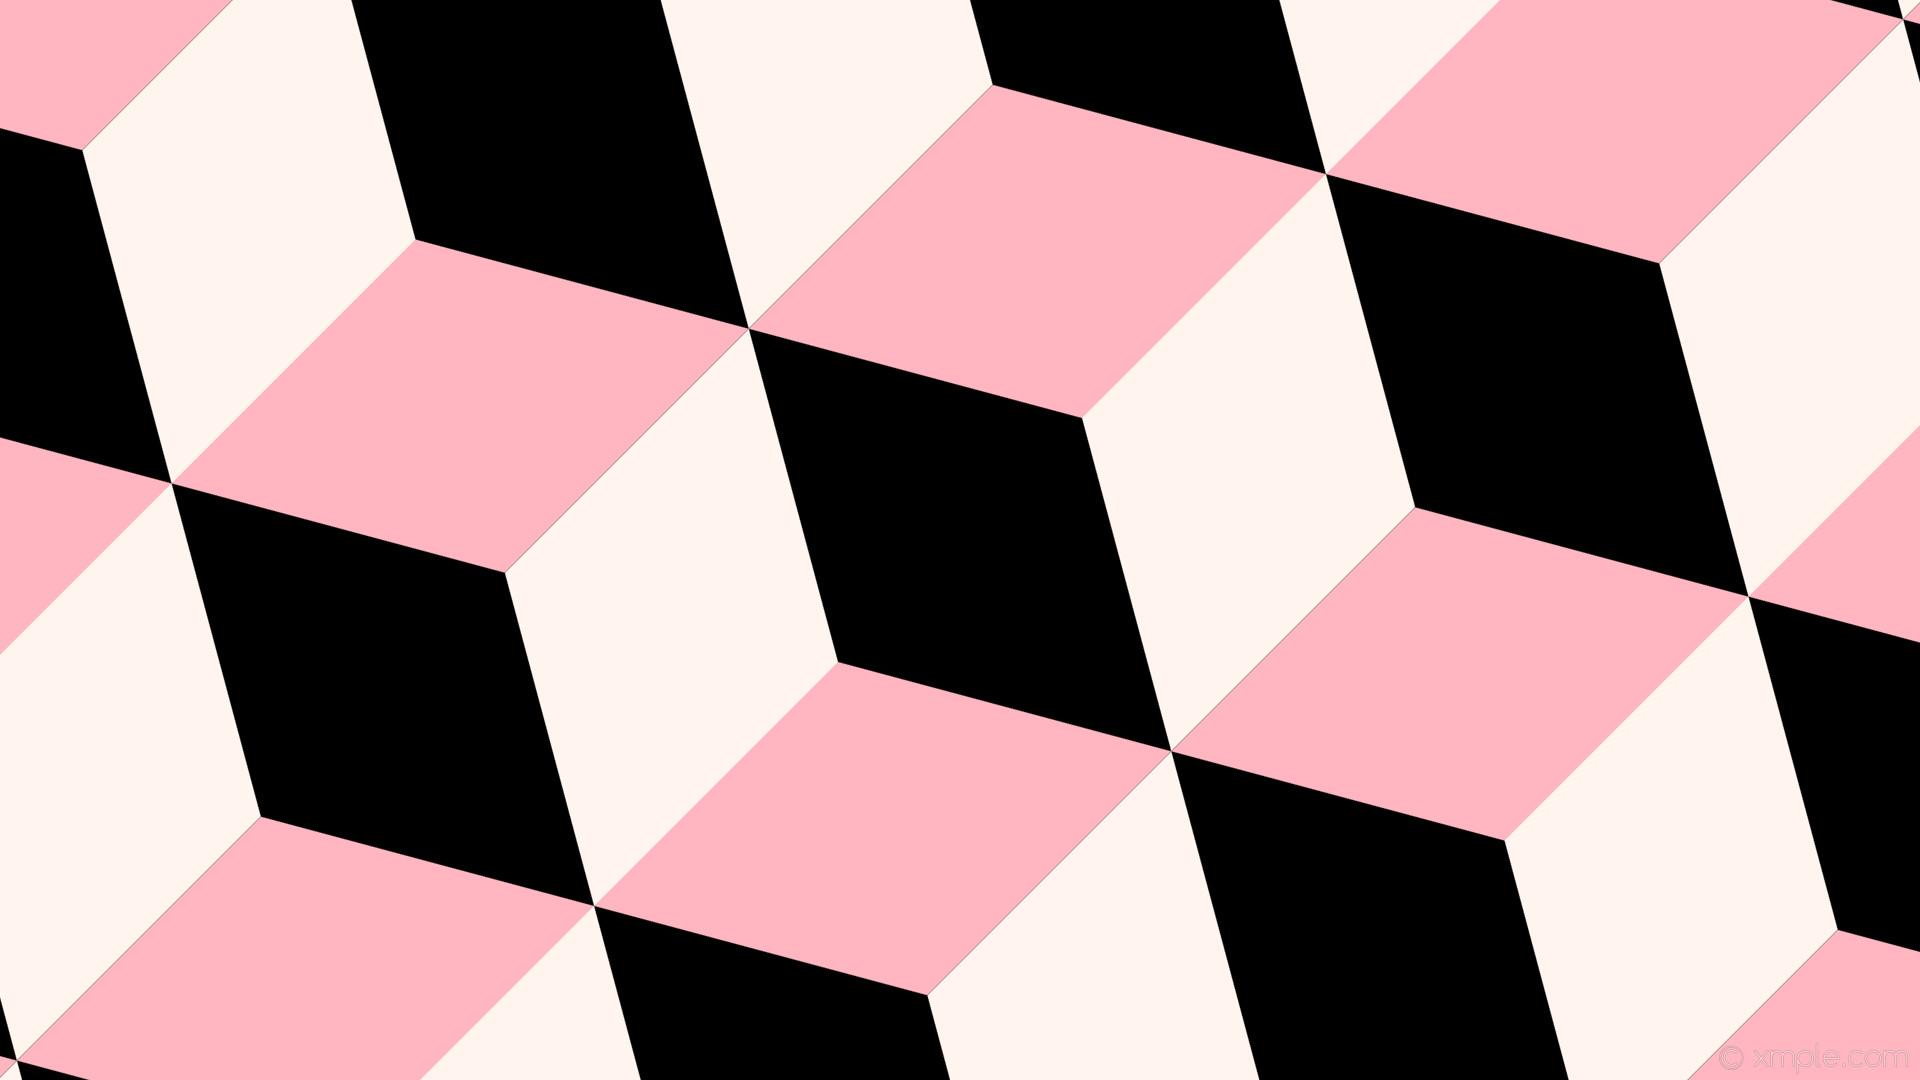 wallpaper pink 3d cubes white black seashell light pink #000000 #fff5ee  #ffb6c1 315